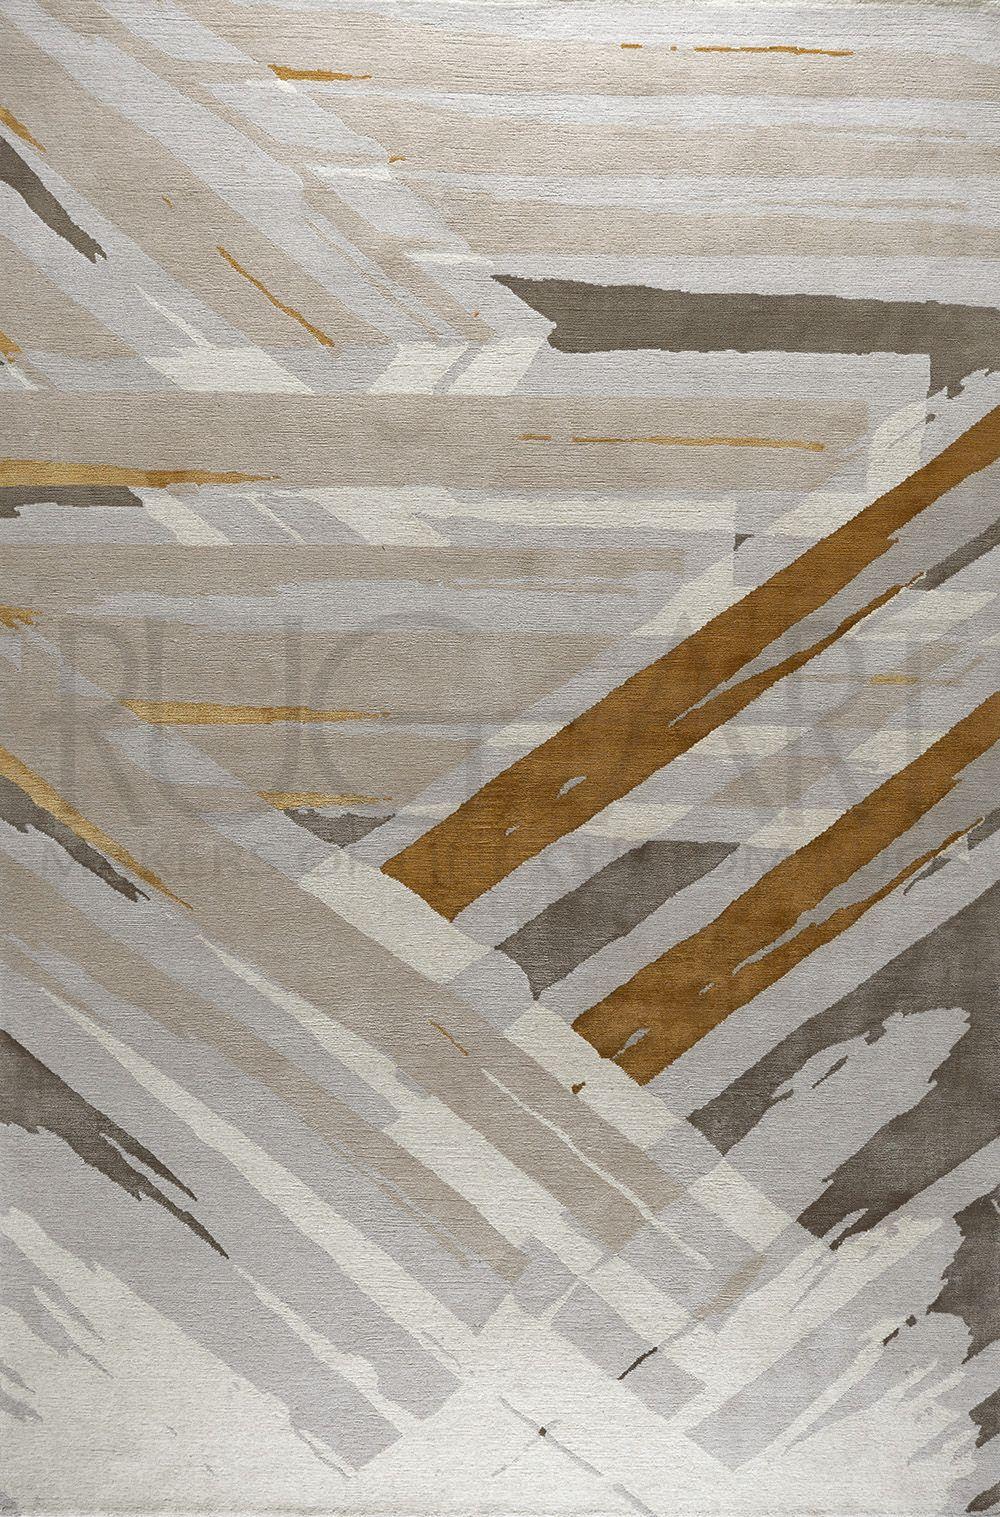 modern carpet design i.pinimg.com/originals/38/a1/a1/38a1a10f263e5f0631... LYGFEFQ